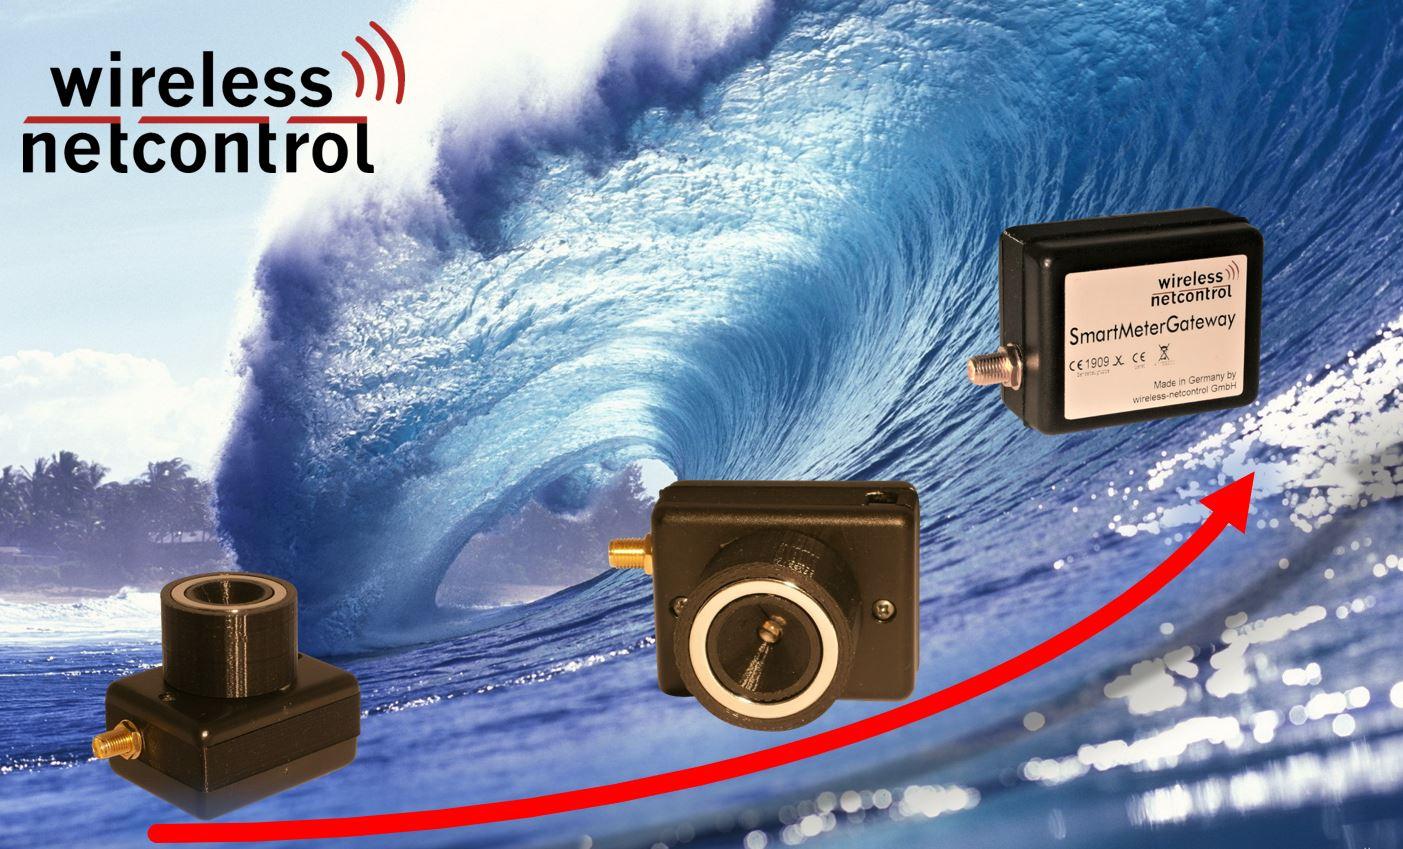 News - Central: Smart MeterGateway